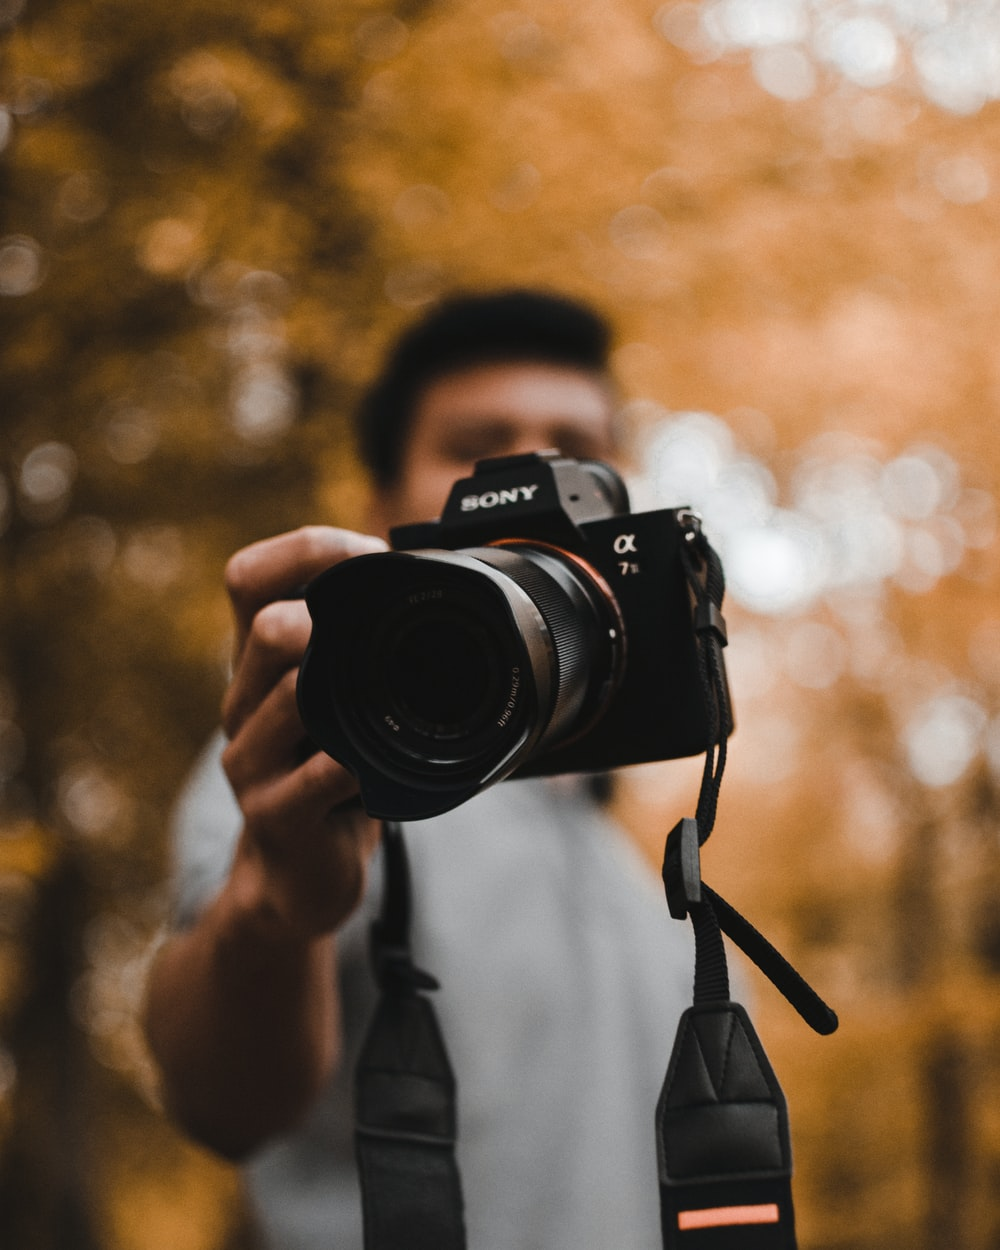 man holding Sony DSLR camera during daytime